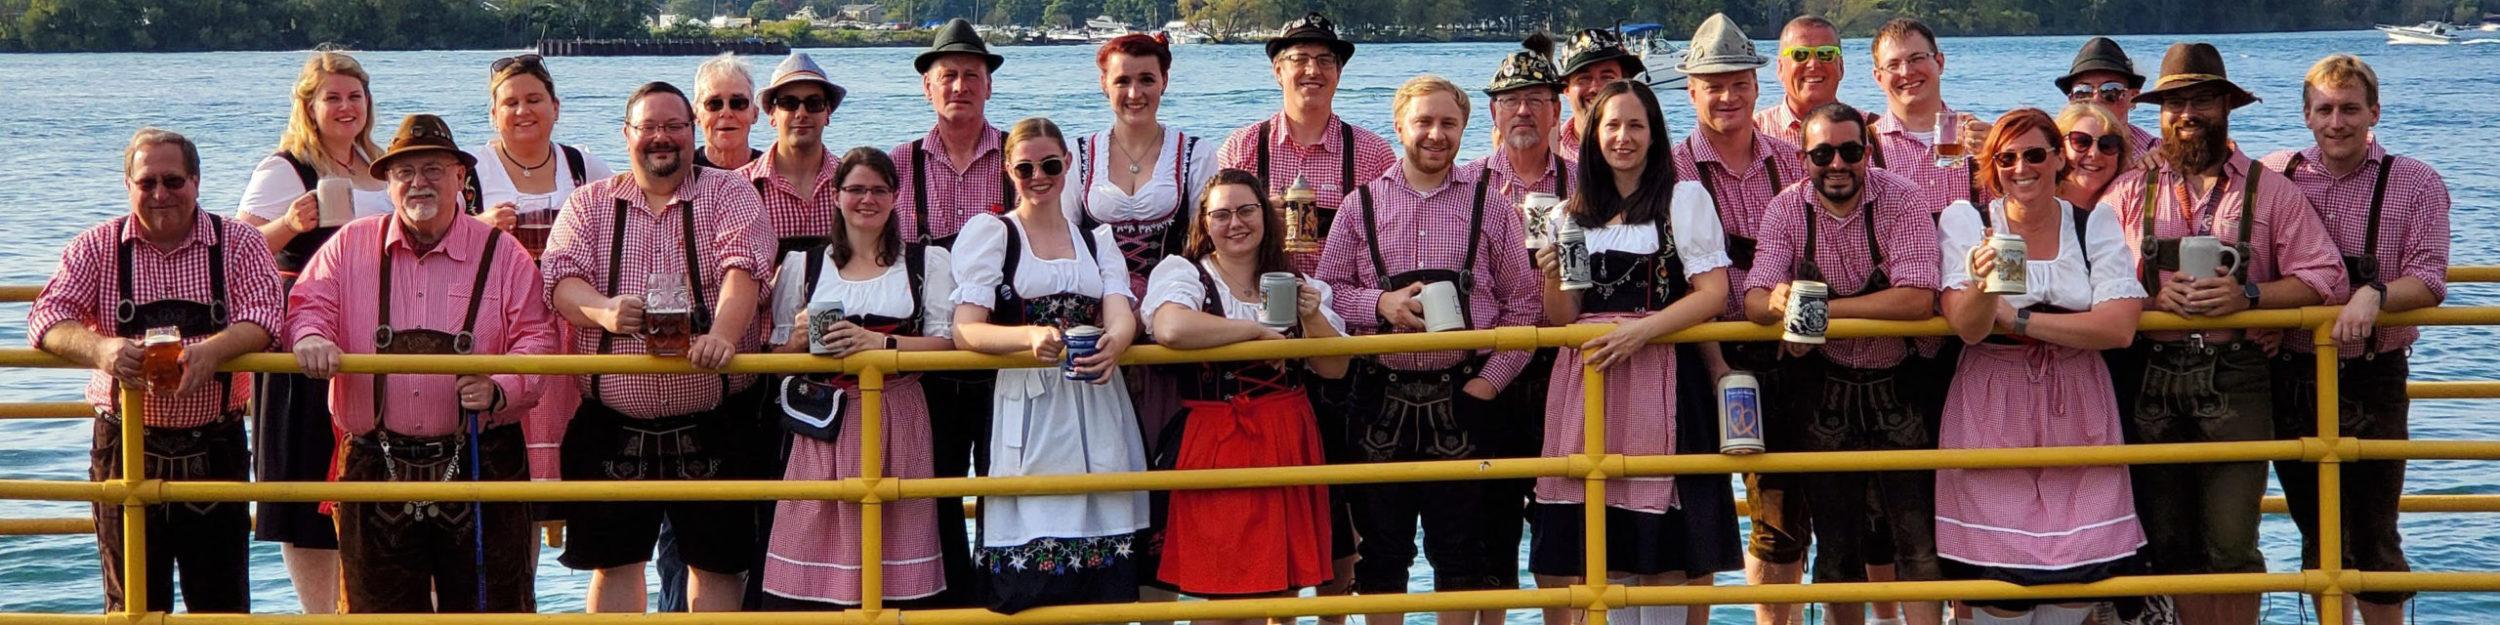 German-American Musicians